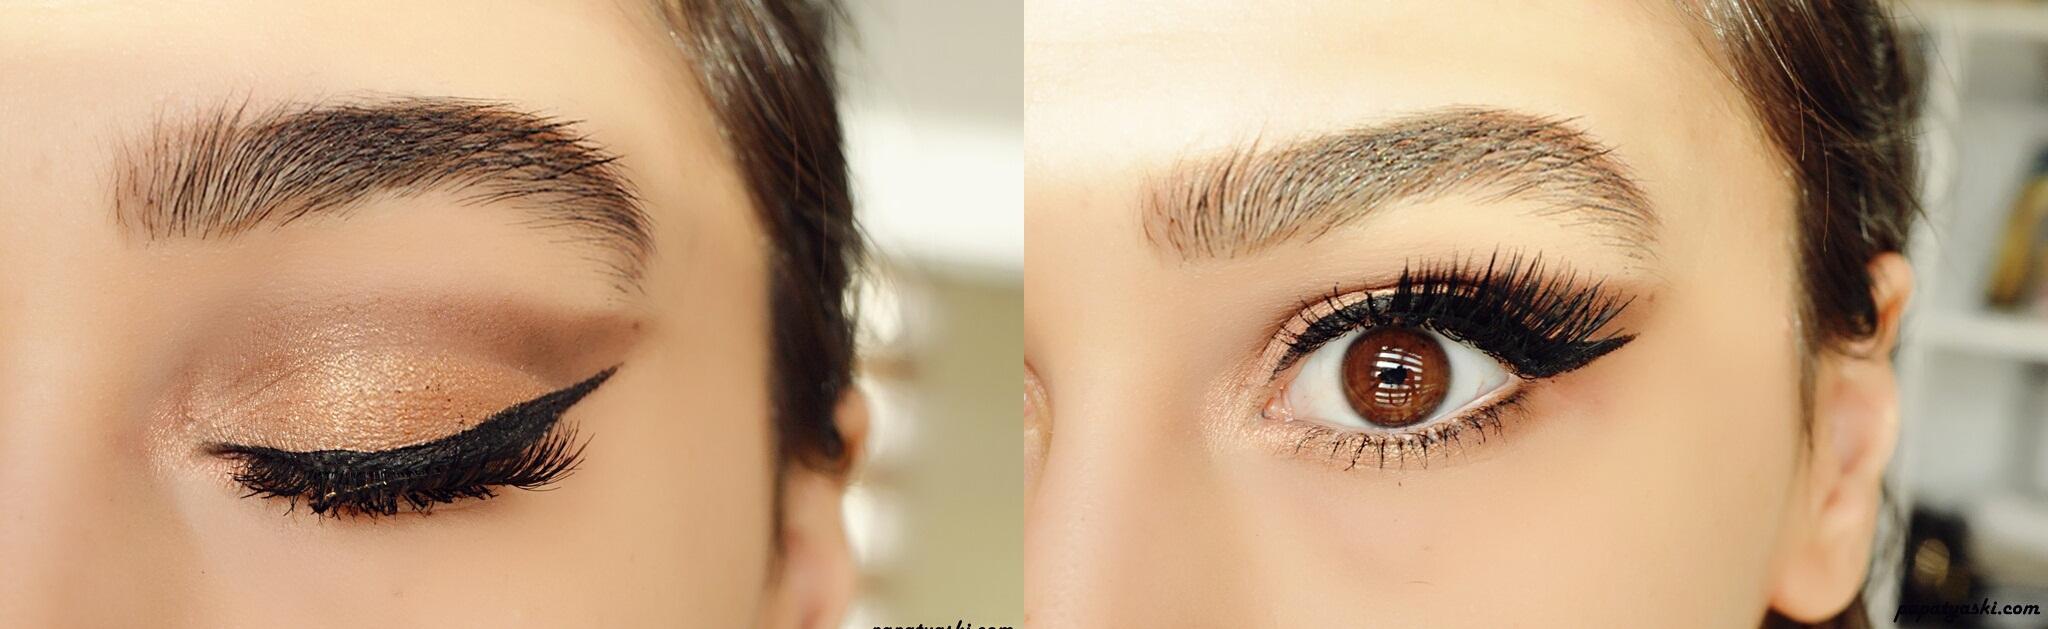 alix-avien-eyeliner-kullananlar-yorumlar